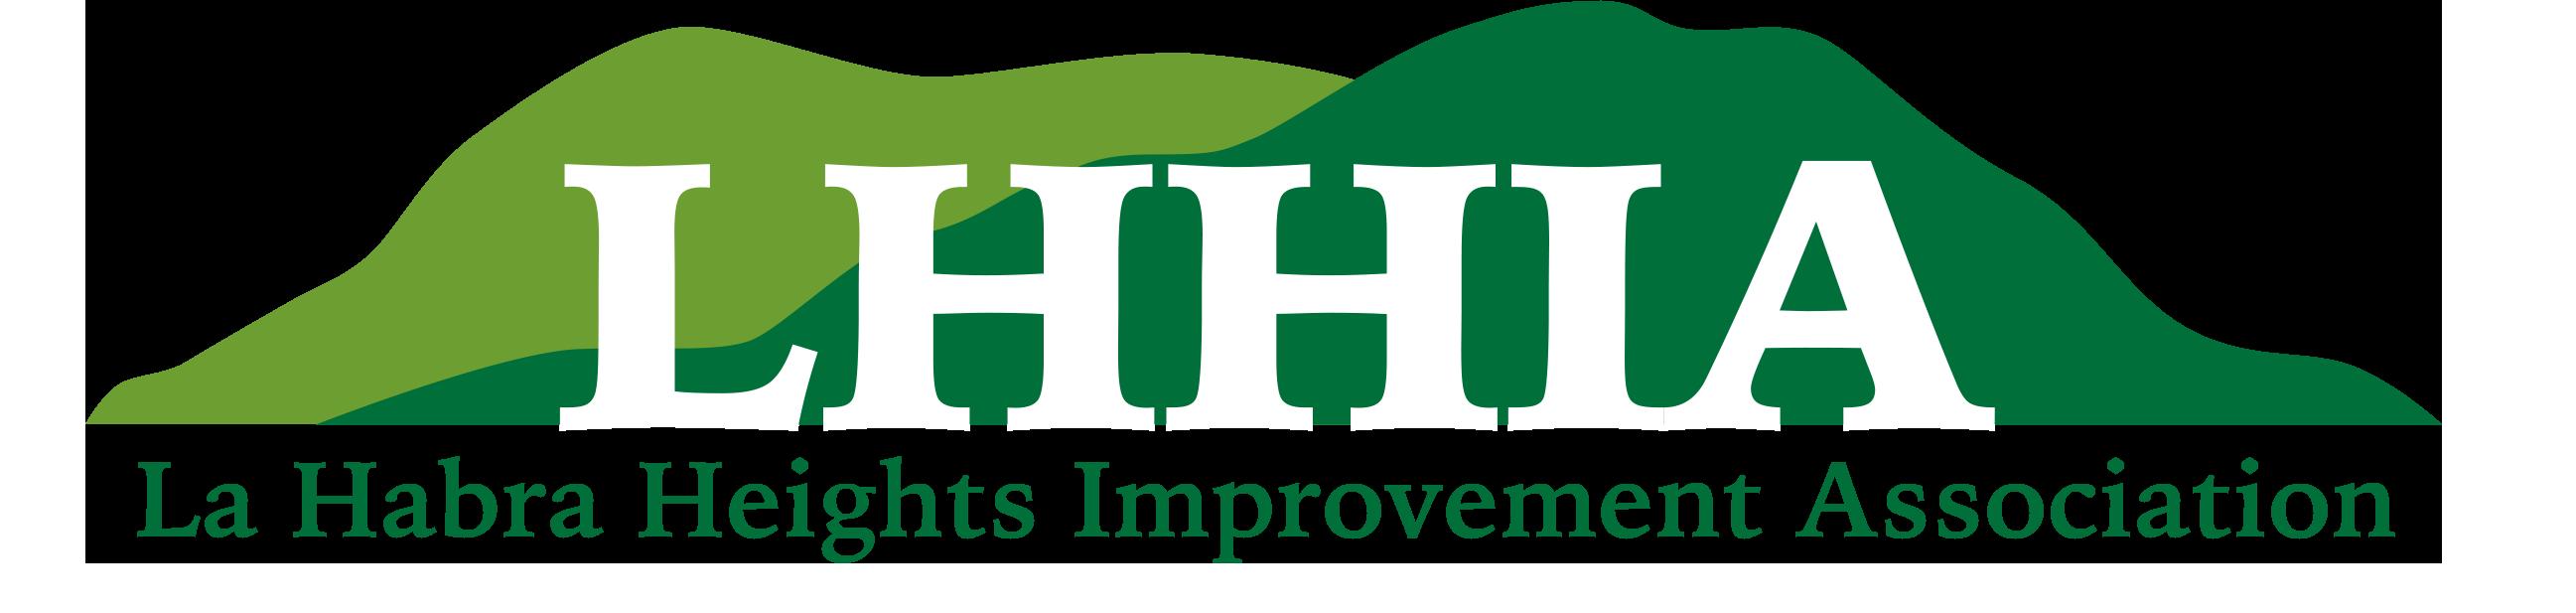 La Habra Heights Improvement Association